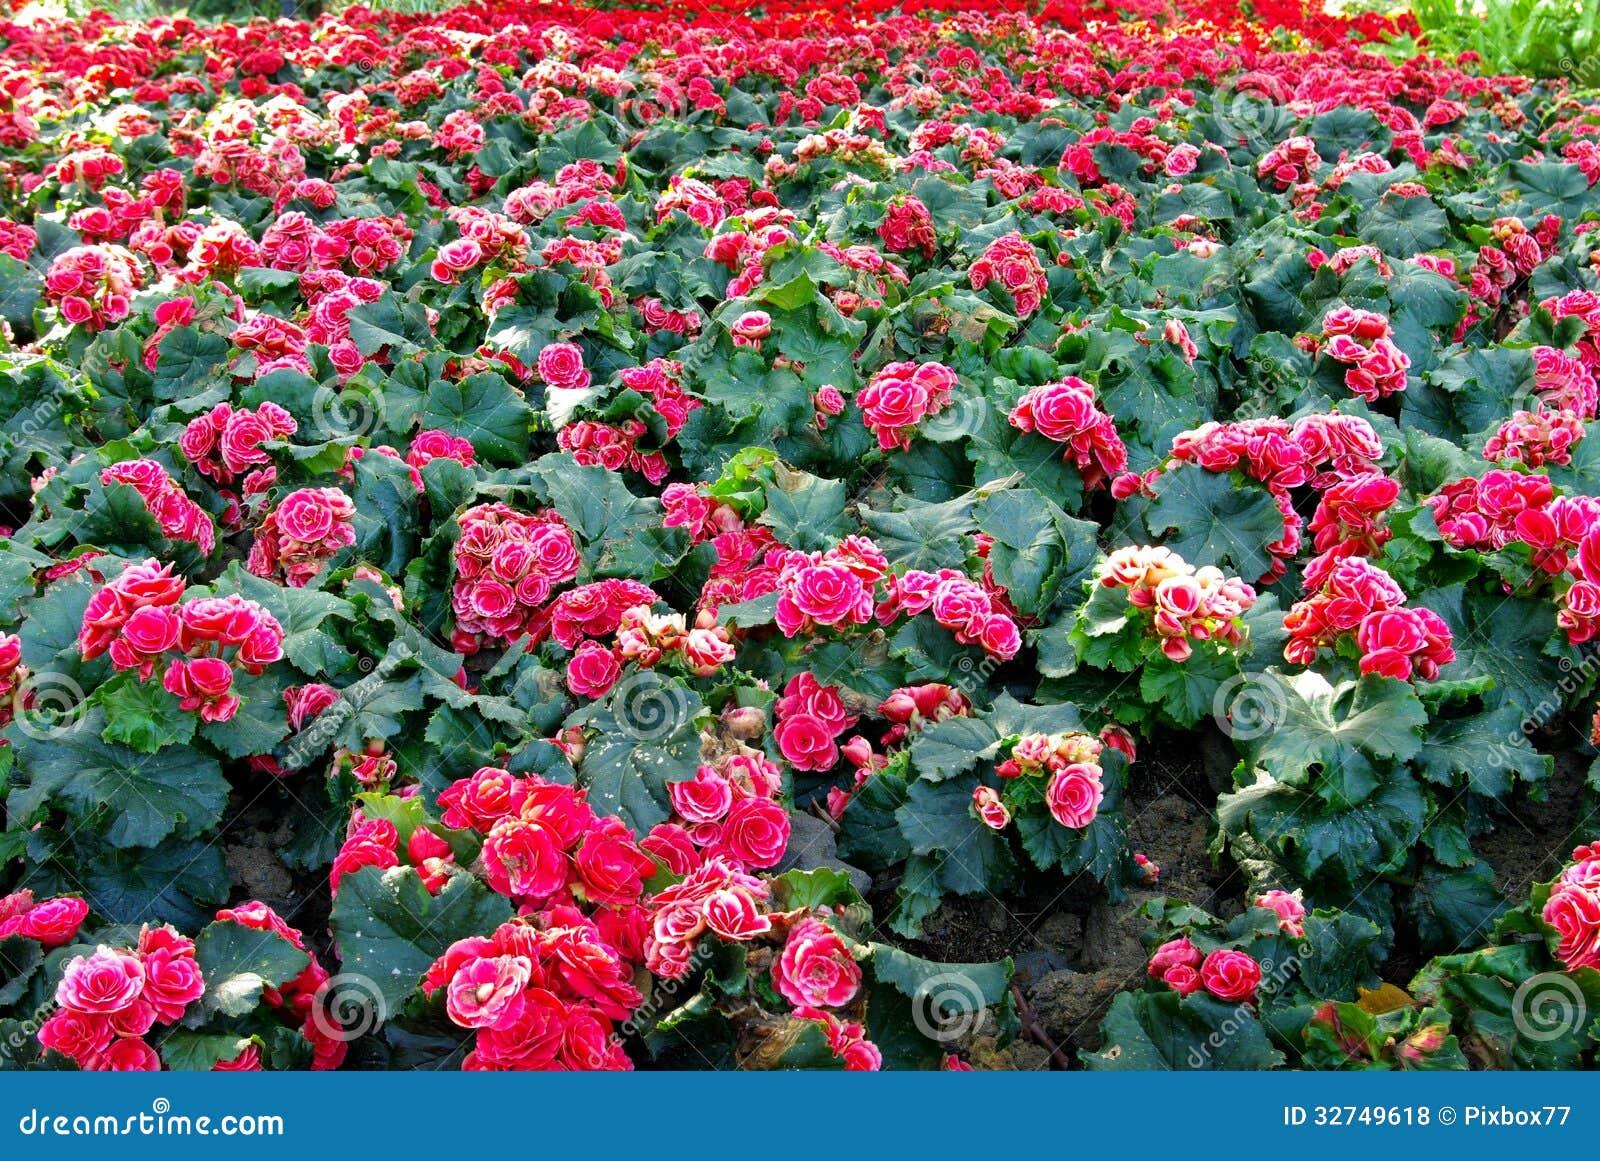 Nice Pink Flower In Garden Royalty Free Stock Photos